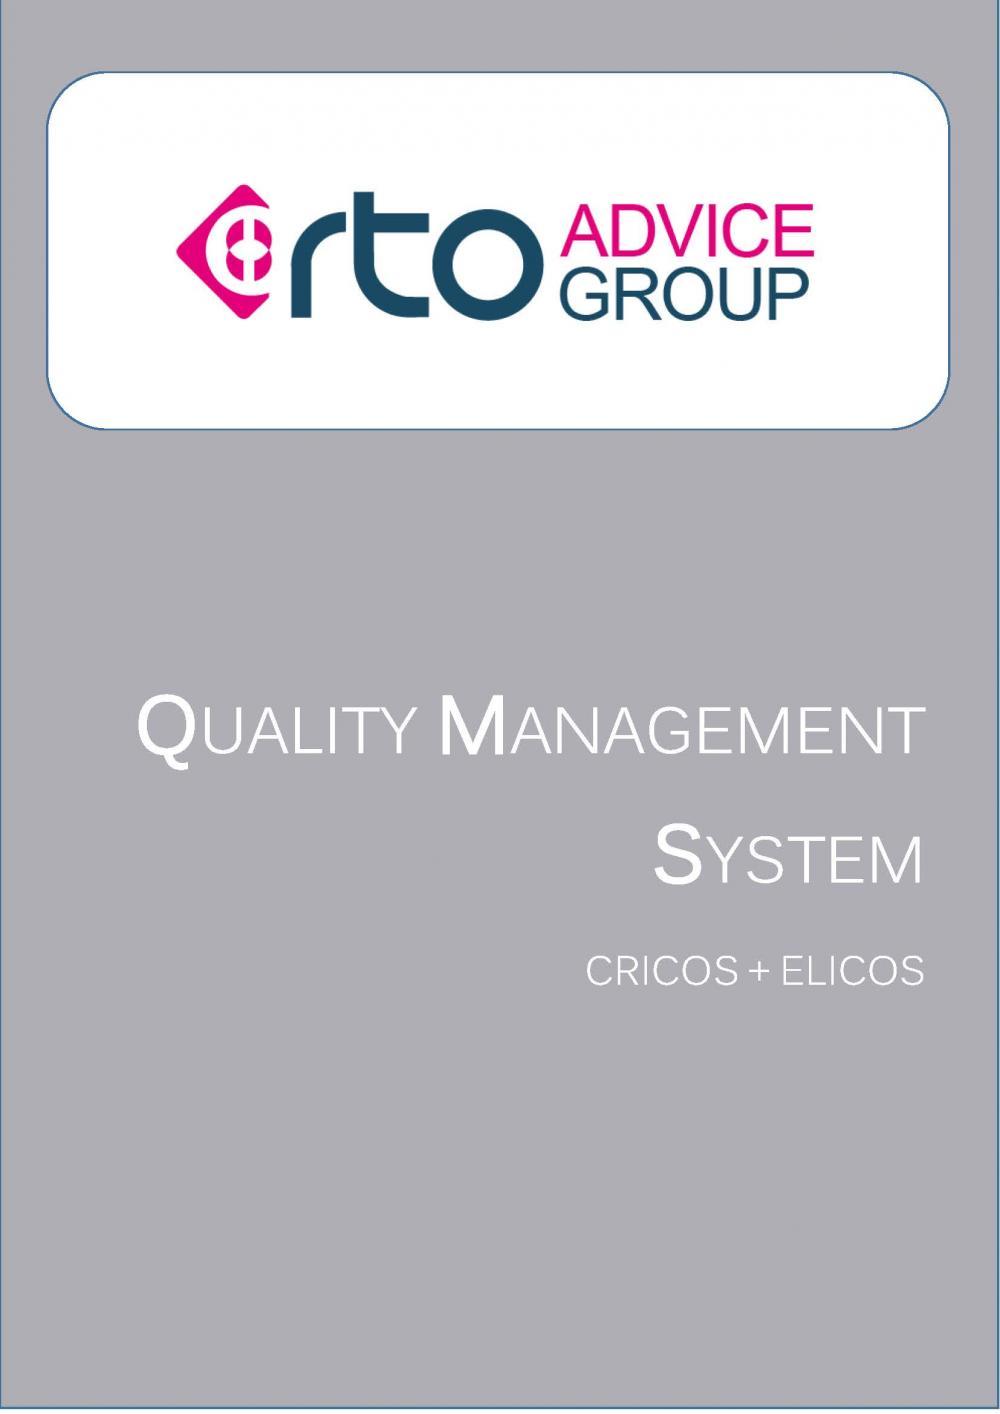 Quality Management System – ELICOS & CRICOS 2018 – RTO Advice Group